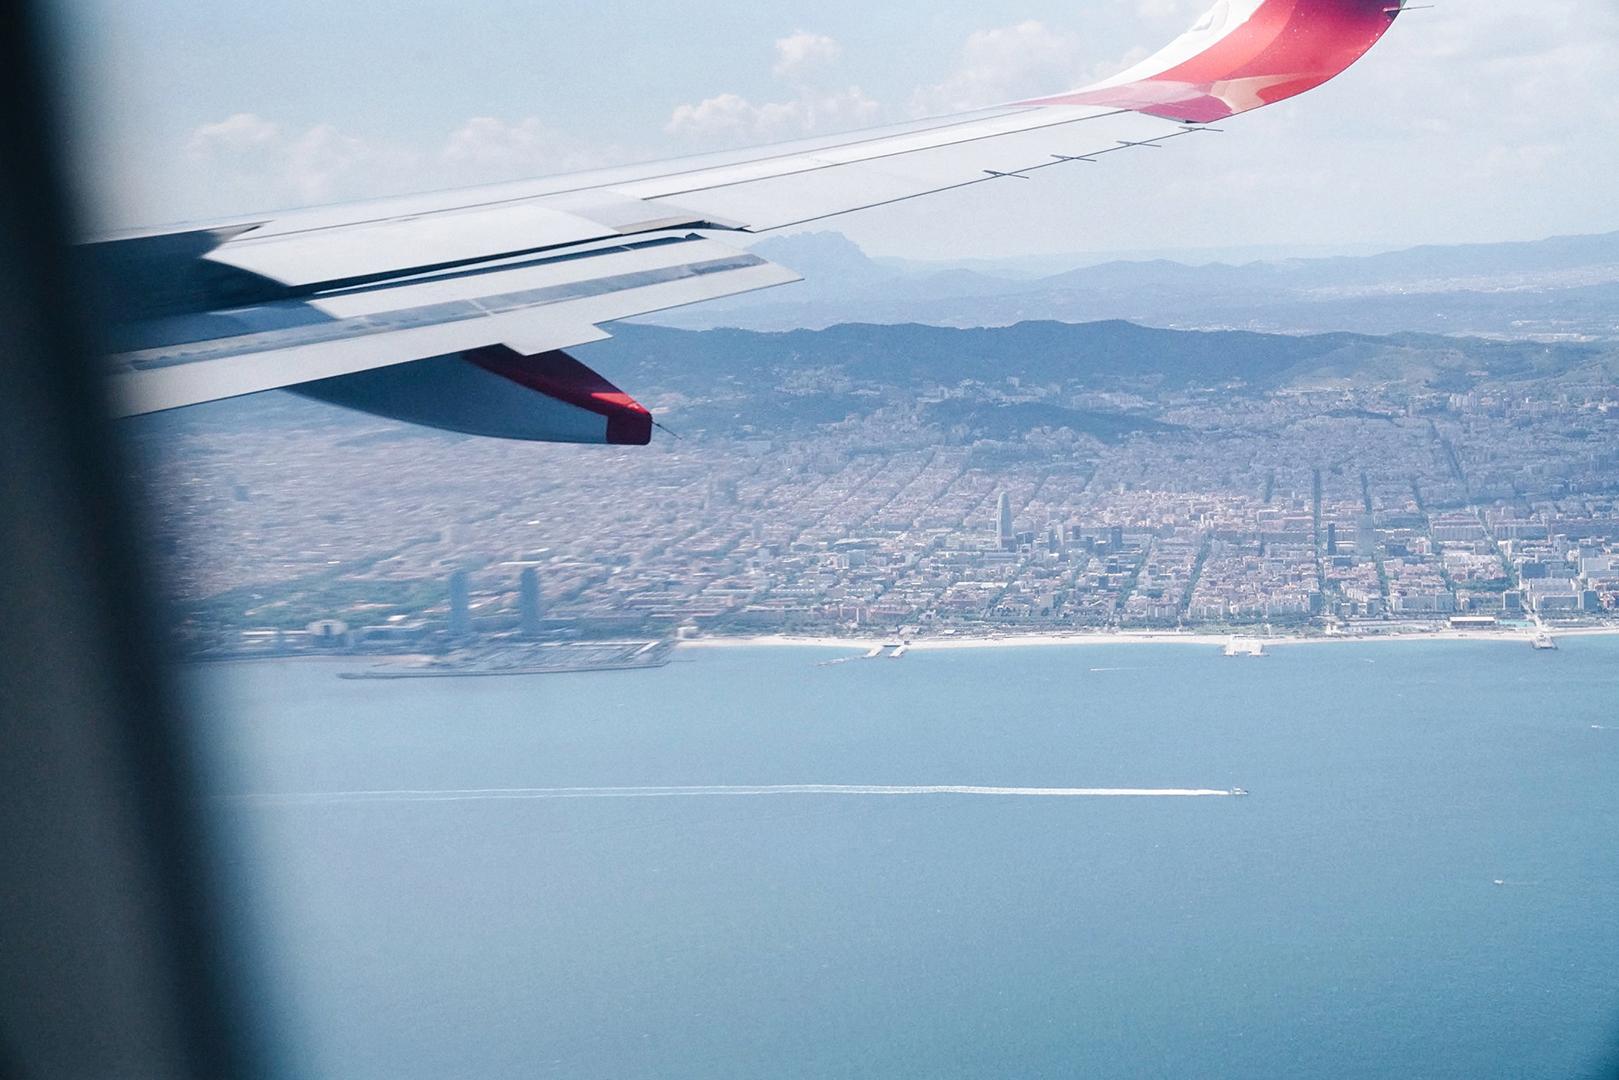 Tchau Portugal, we're off to Spain!